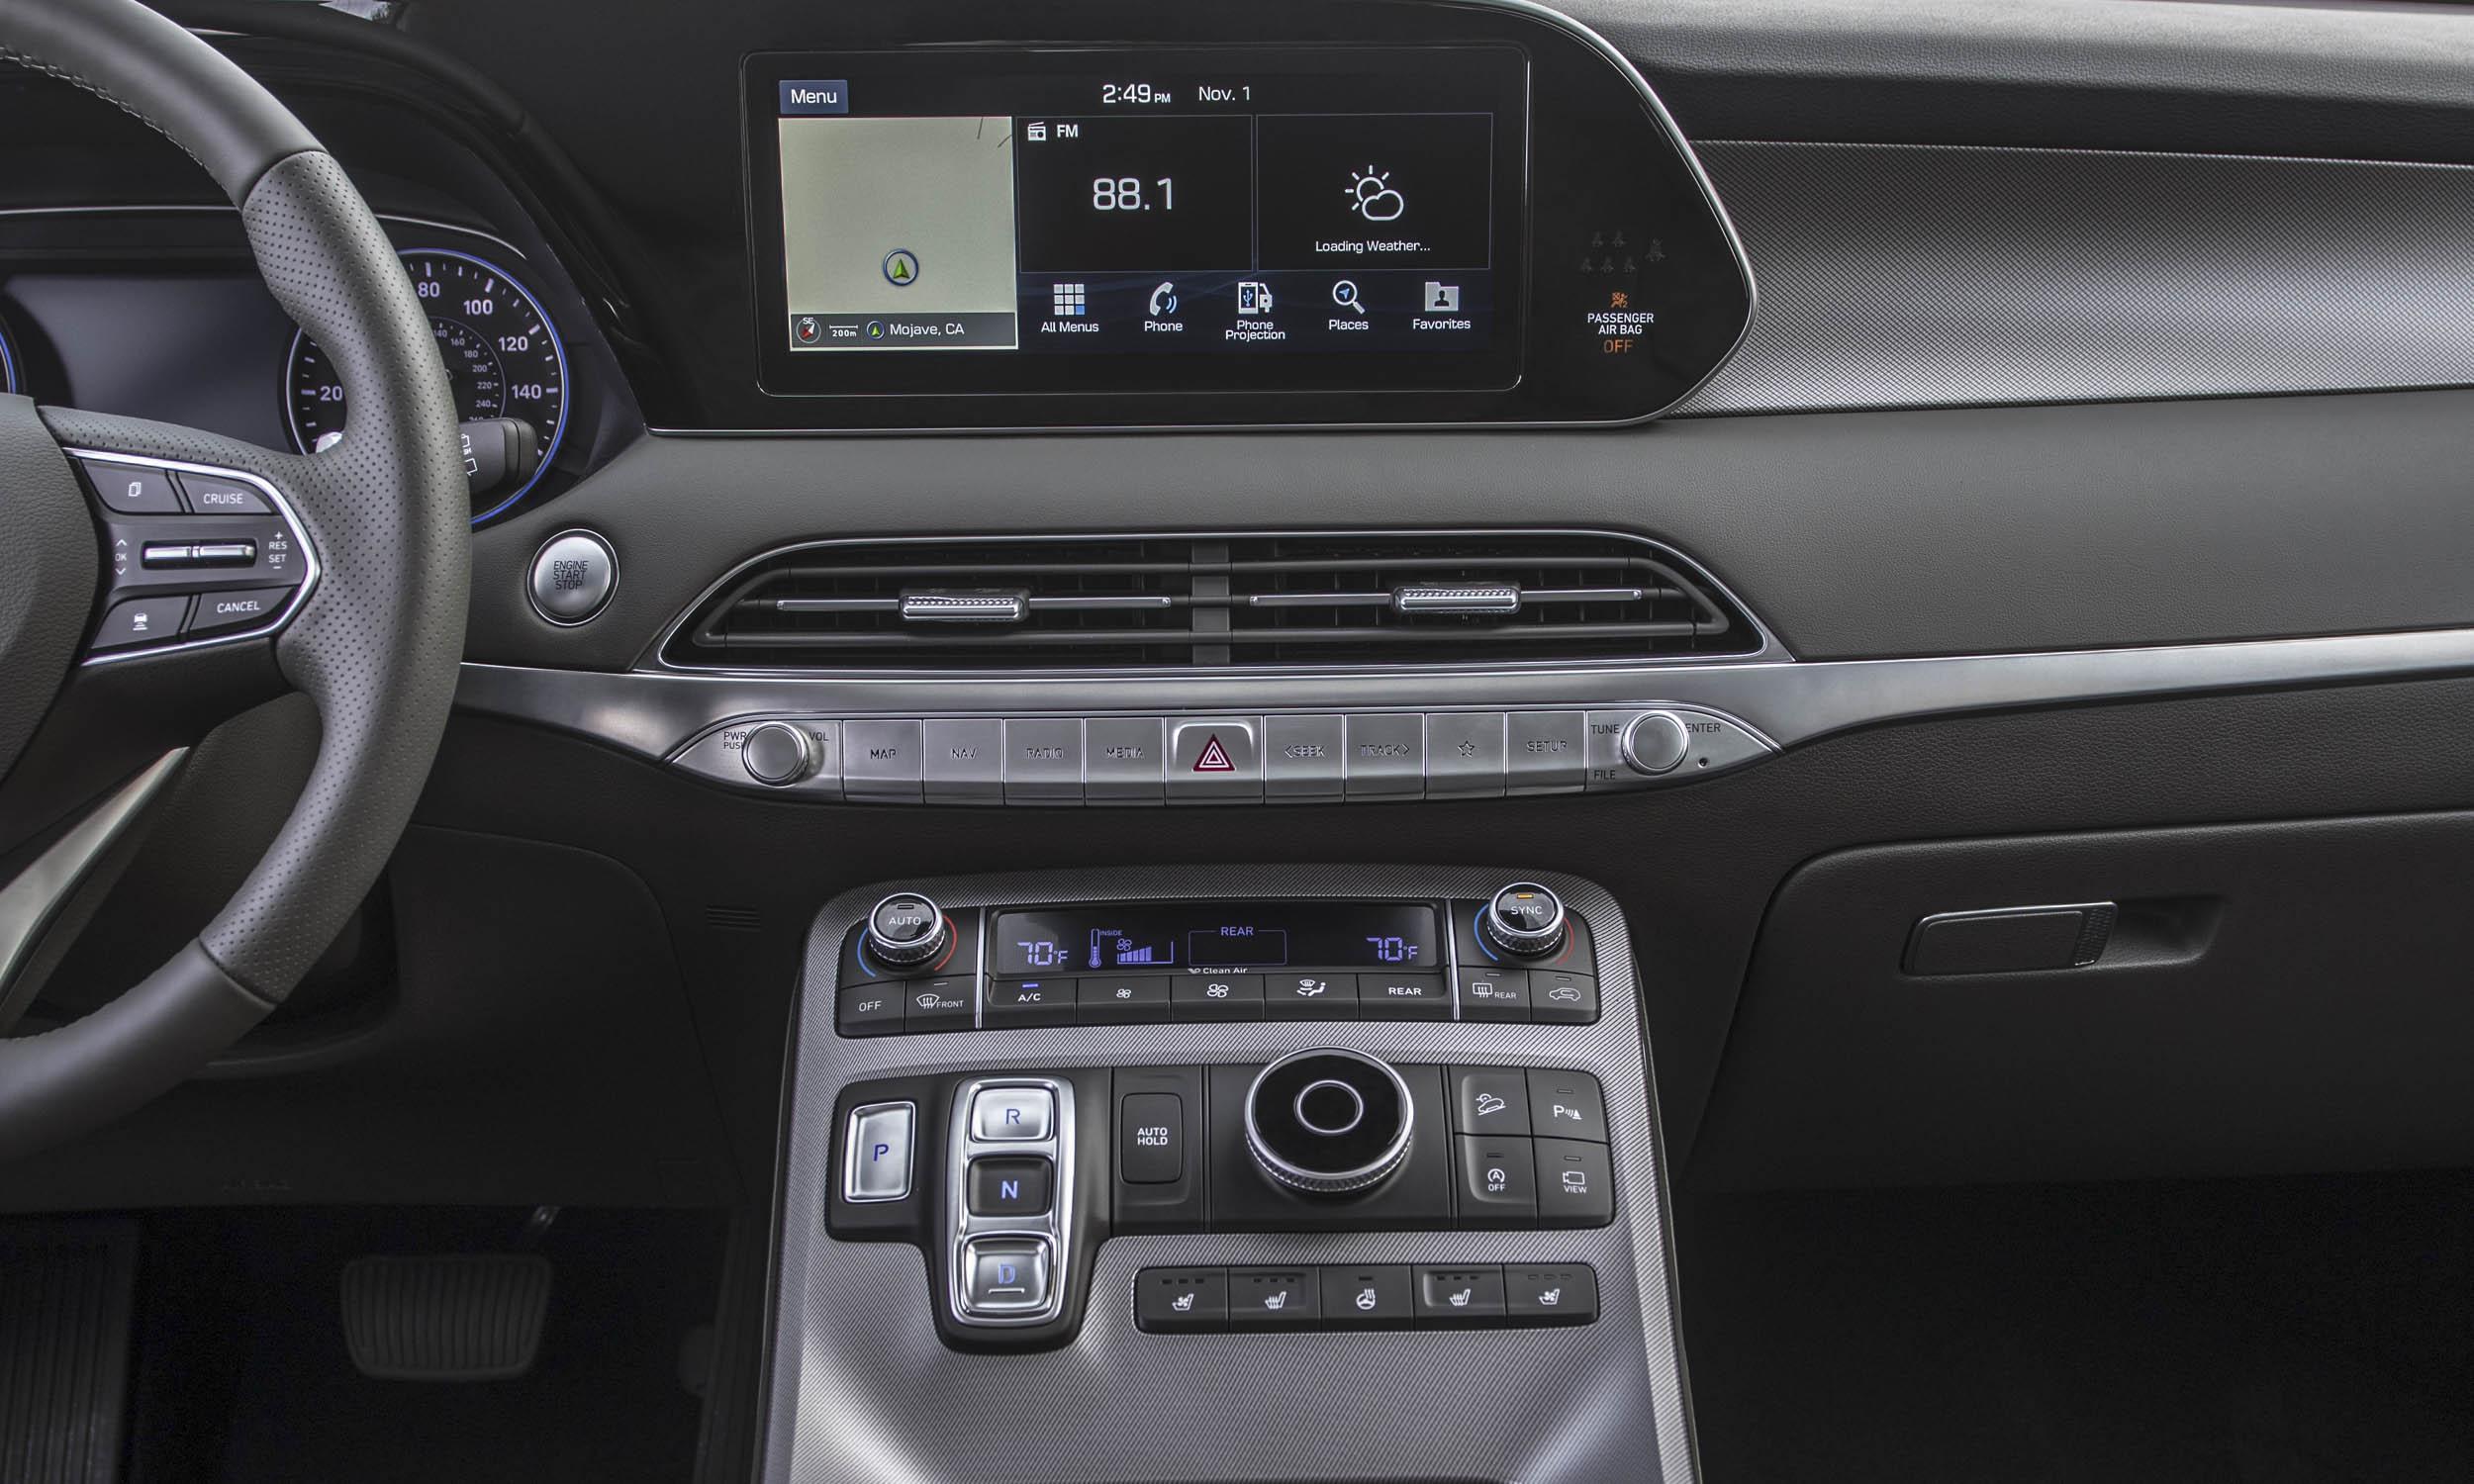 2020 Hyundai Palisade: First Drive Review - » AutoNXT